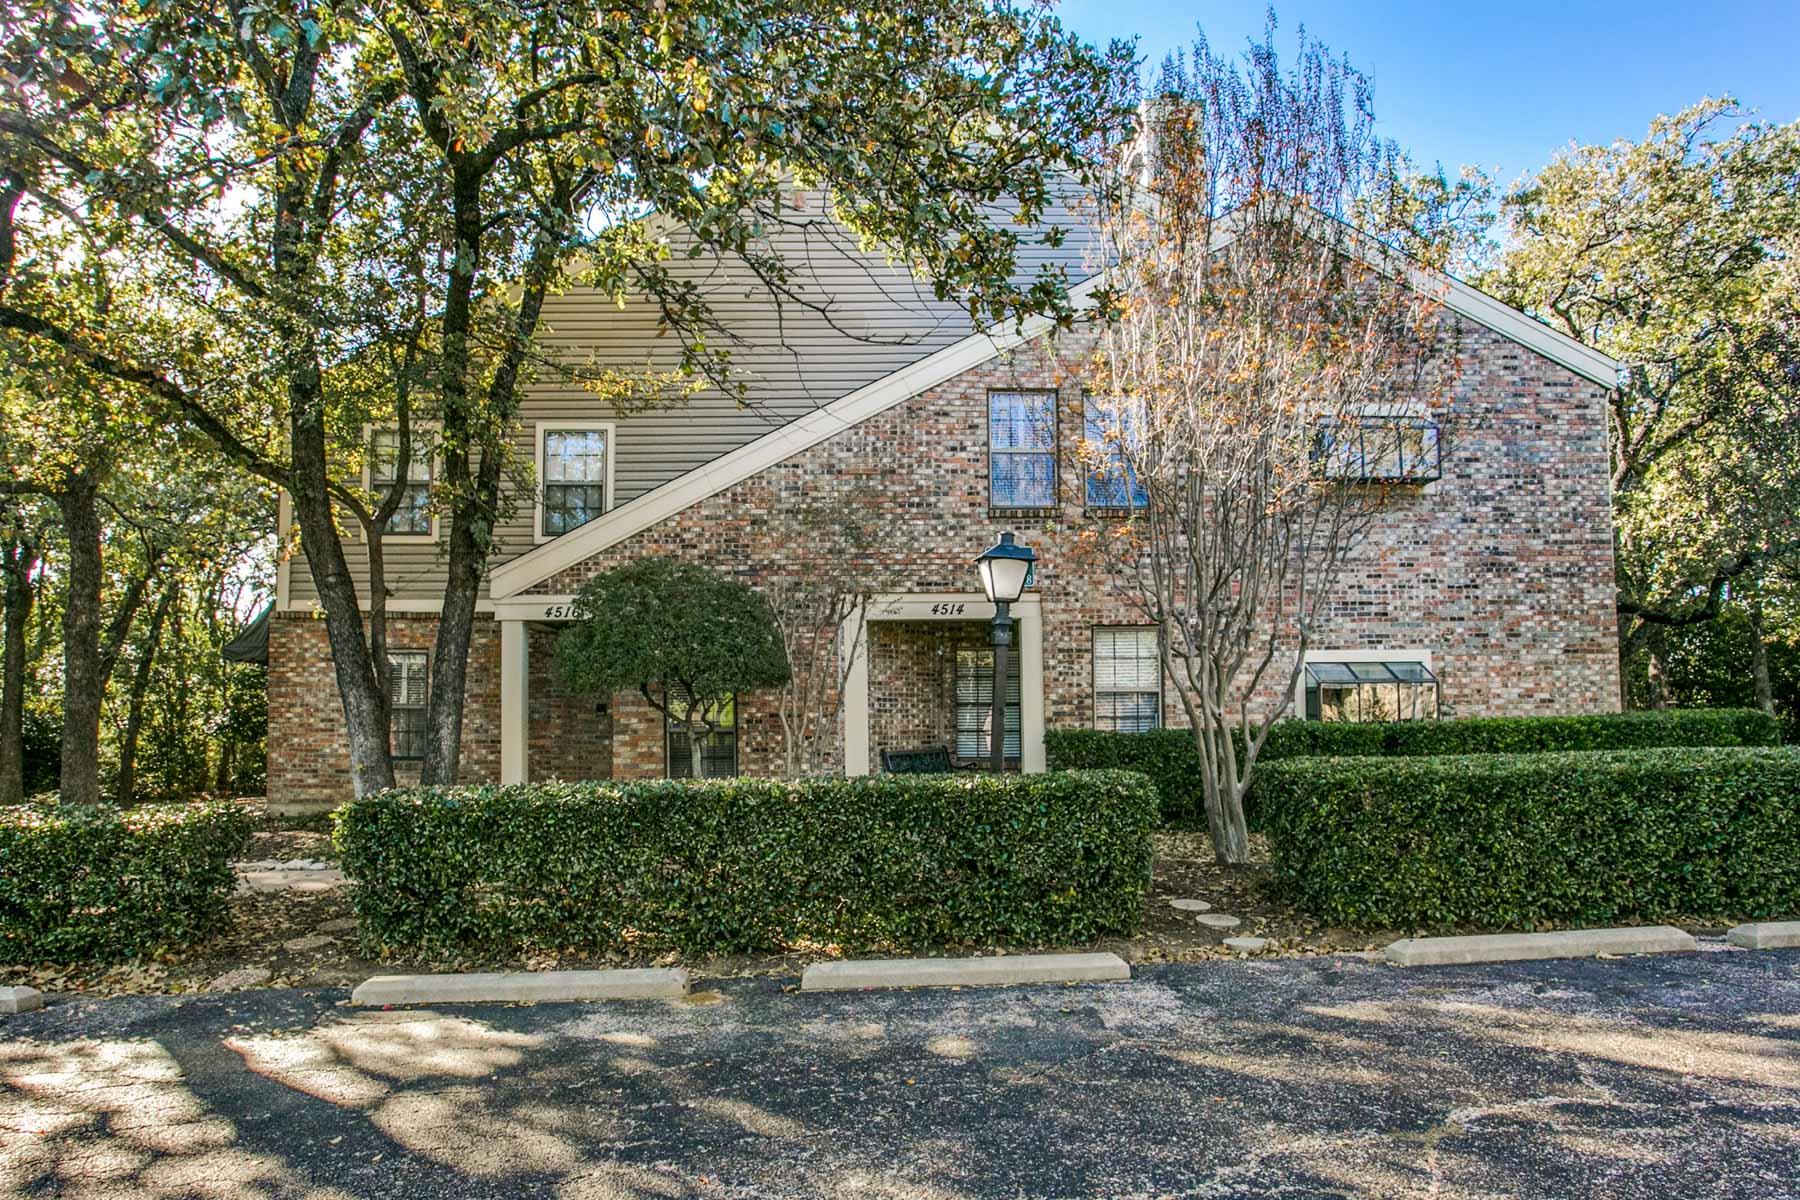 Nhà chung cư vì Bán tại Semi-Contemporary Condominum 4516 Forestgate Circle Arlington, Texas, 76017 Hoa Kỳ